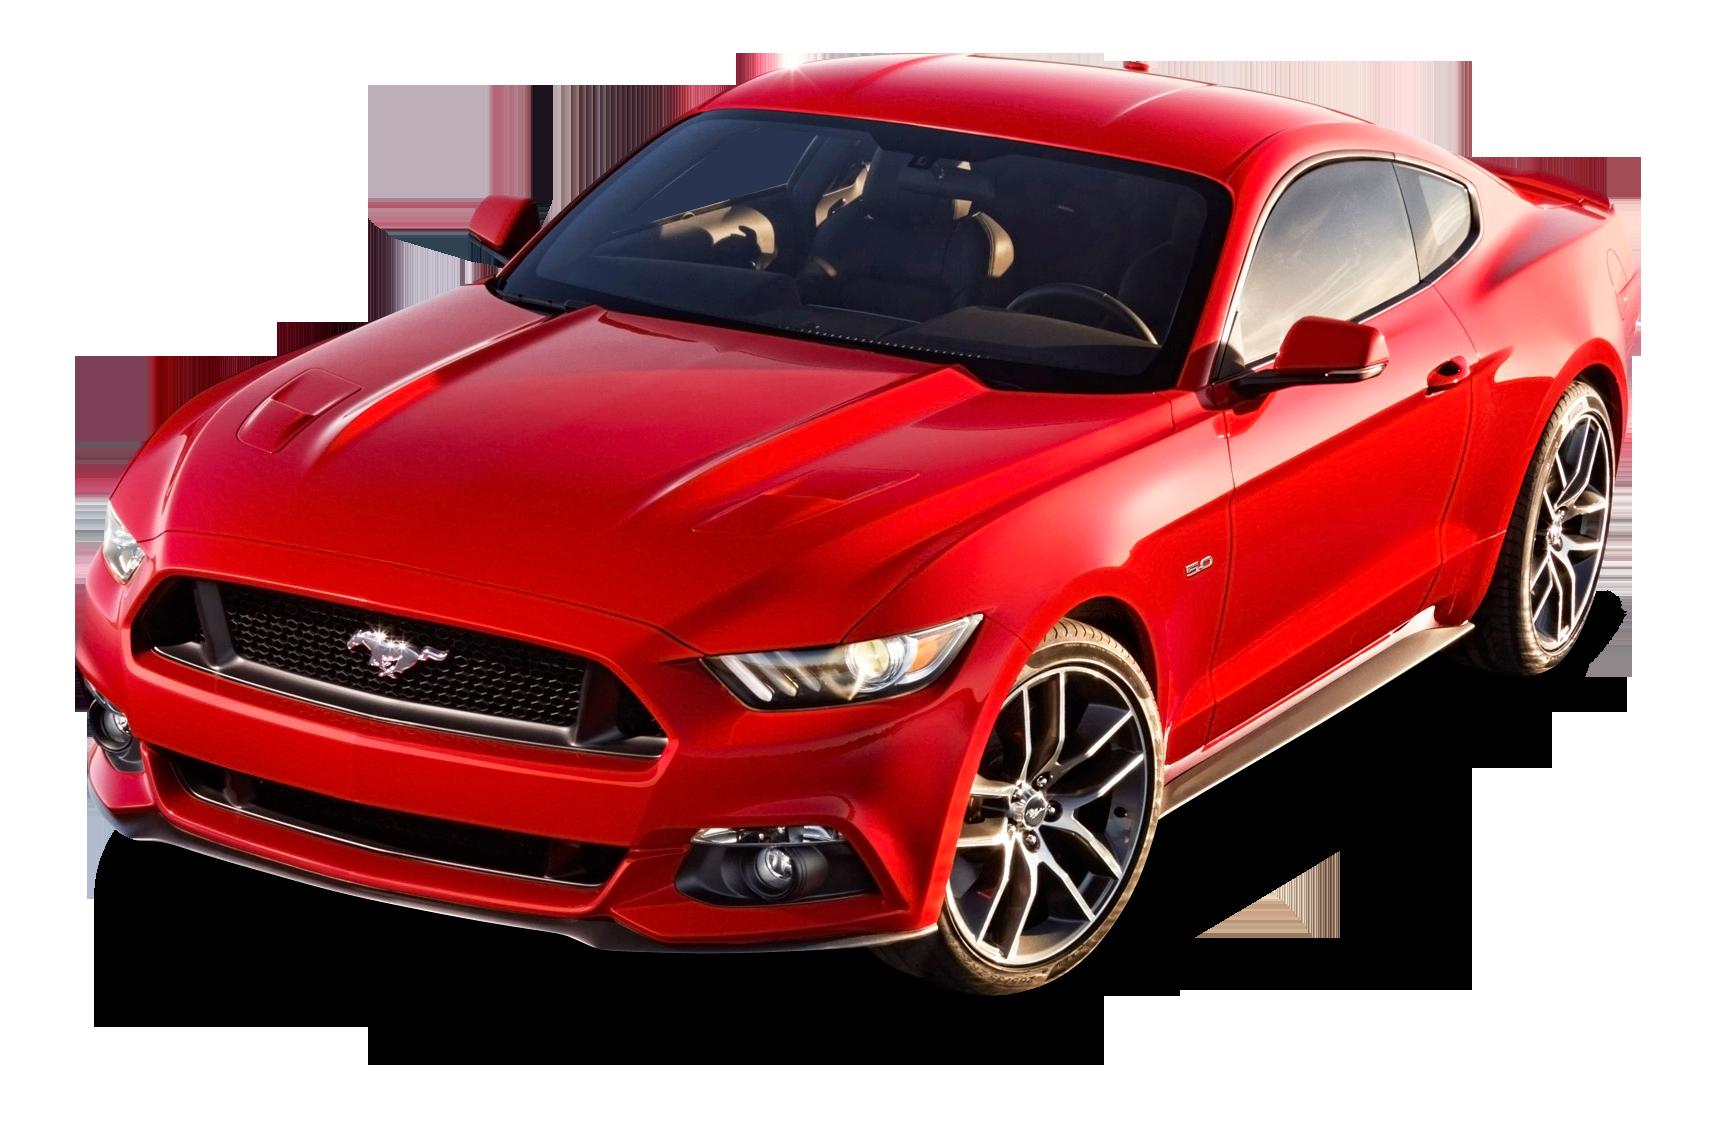 Transparentes Ford Mustang Red Car Png Bild Kostenlos